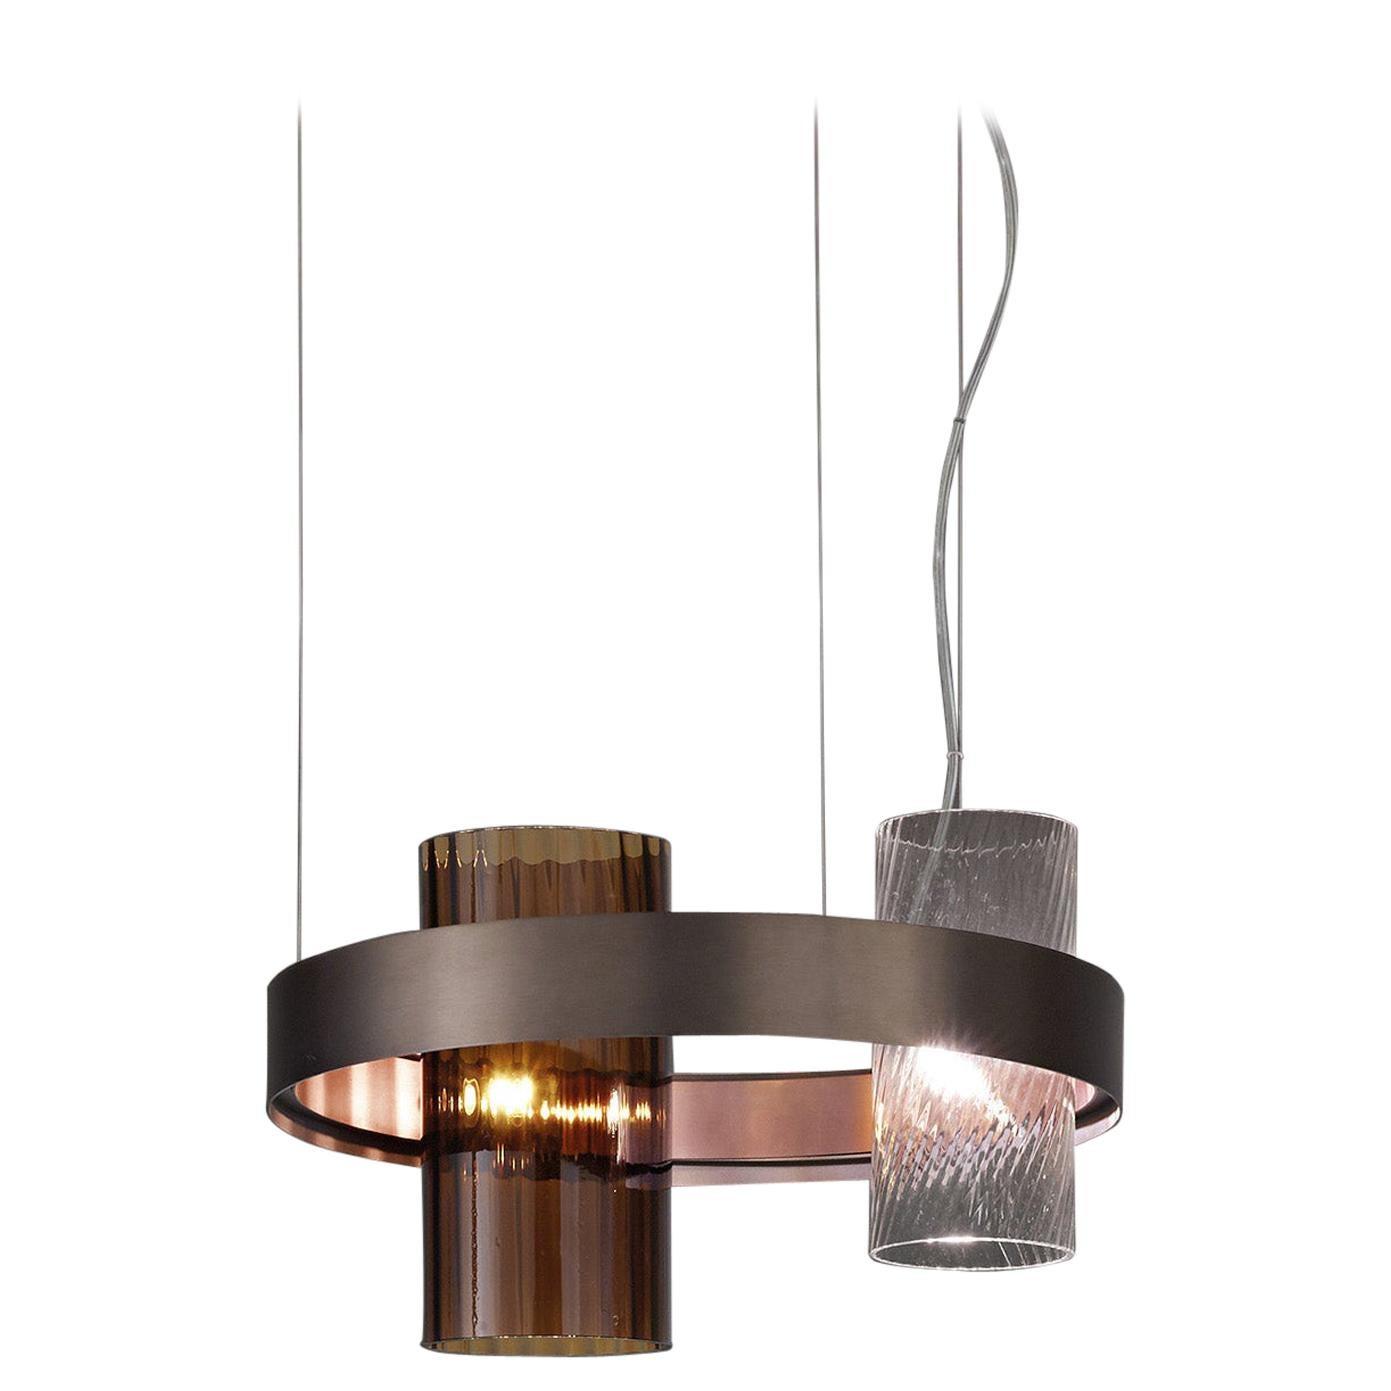 Vistosi Armonia Medium Suspension Light with Black Frame by Francesco Lucchese